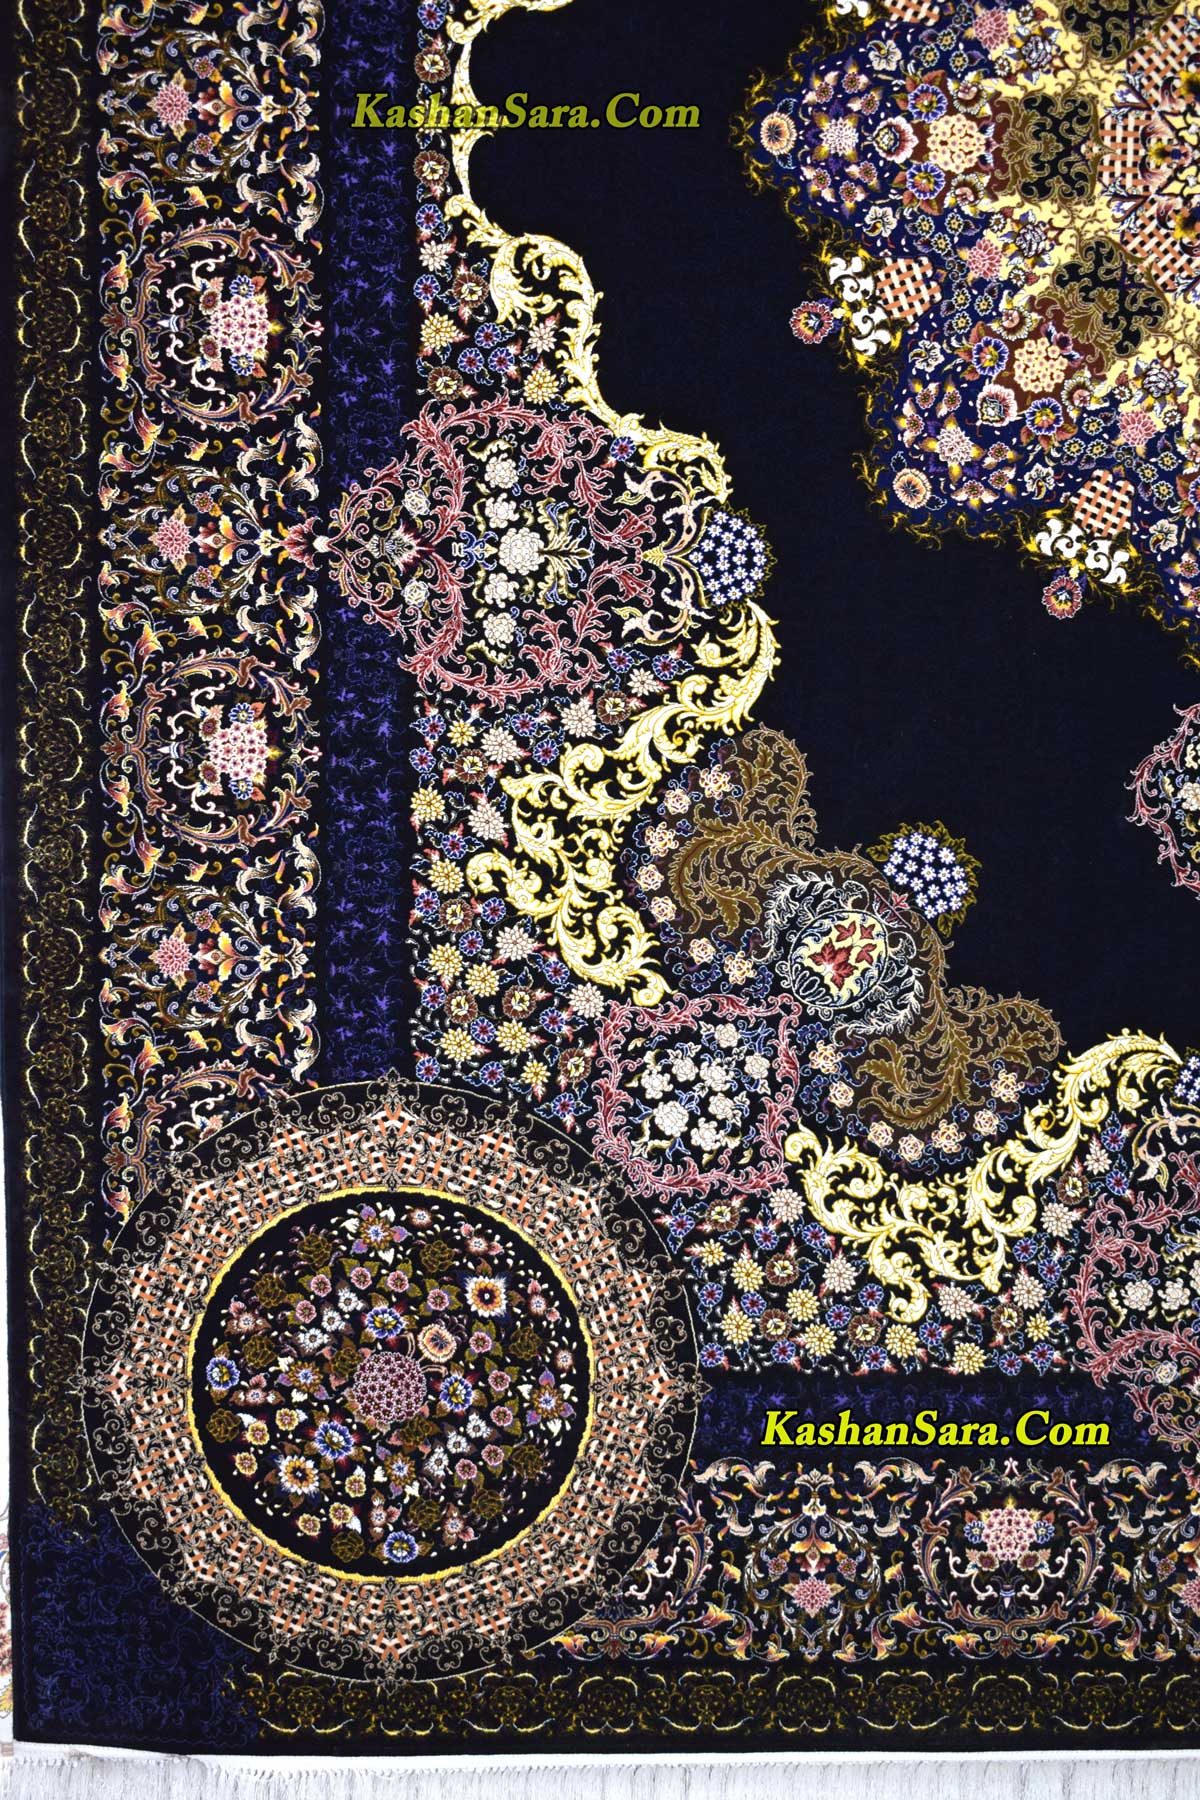 فرش ۱۰۰۰ شانه کاشان نقشه فروزان